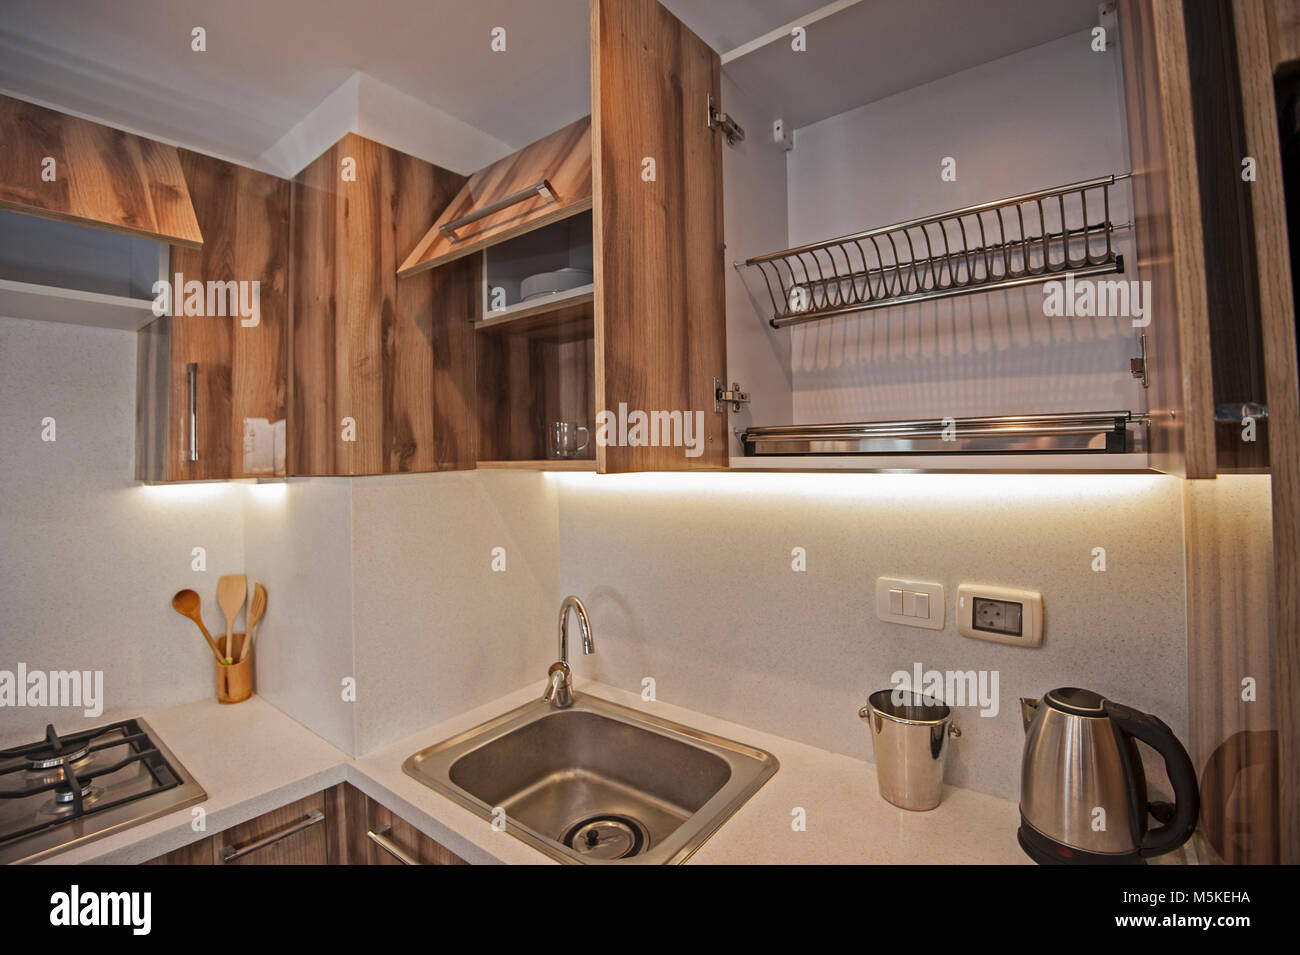 Interior Design Decor Showing Modern Kitchen And Sink In Luxury Stock Photo Alamy